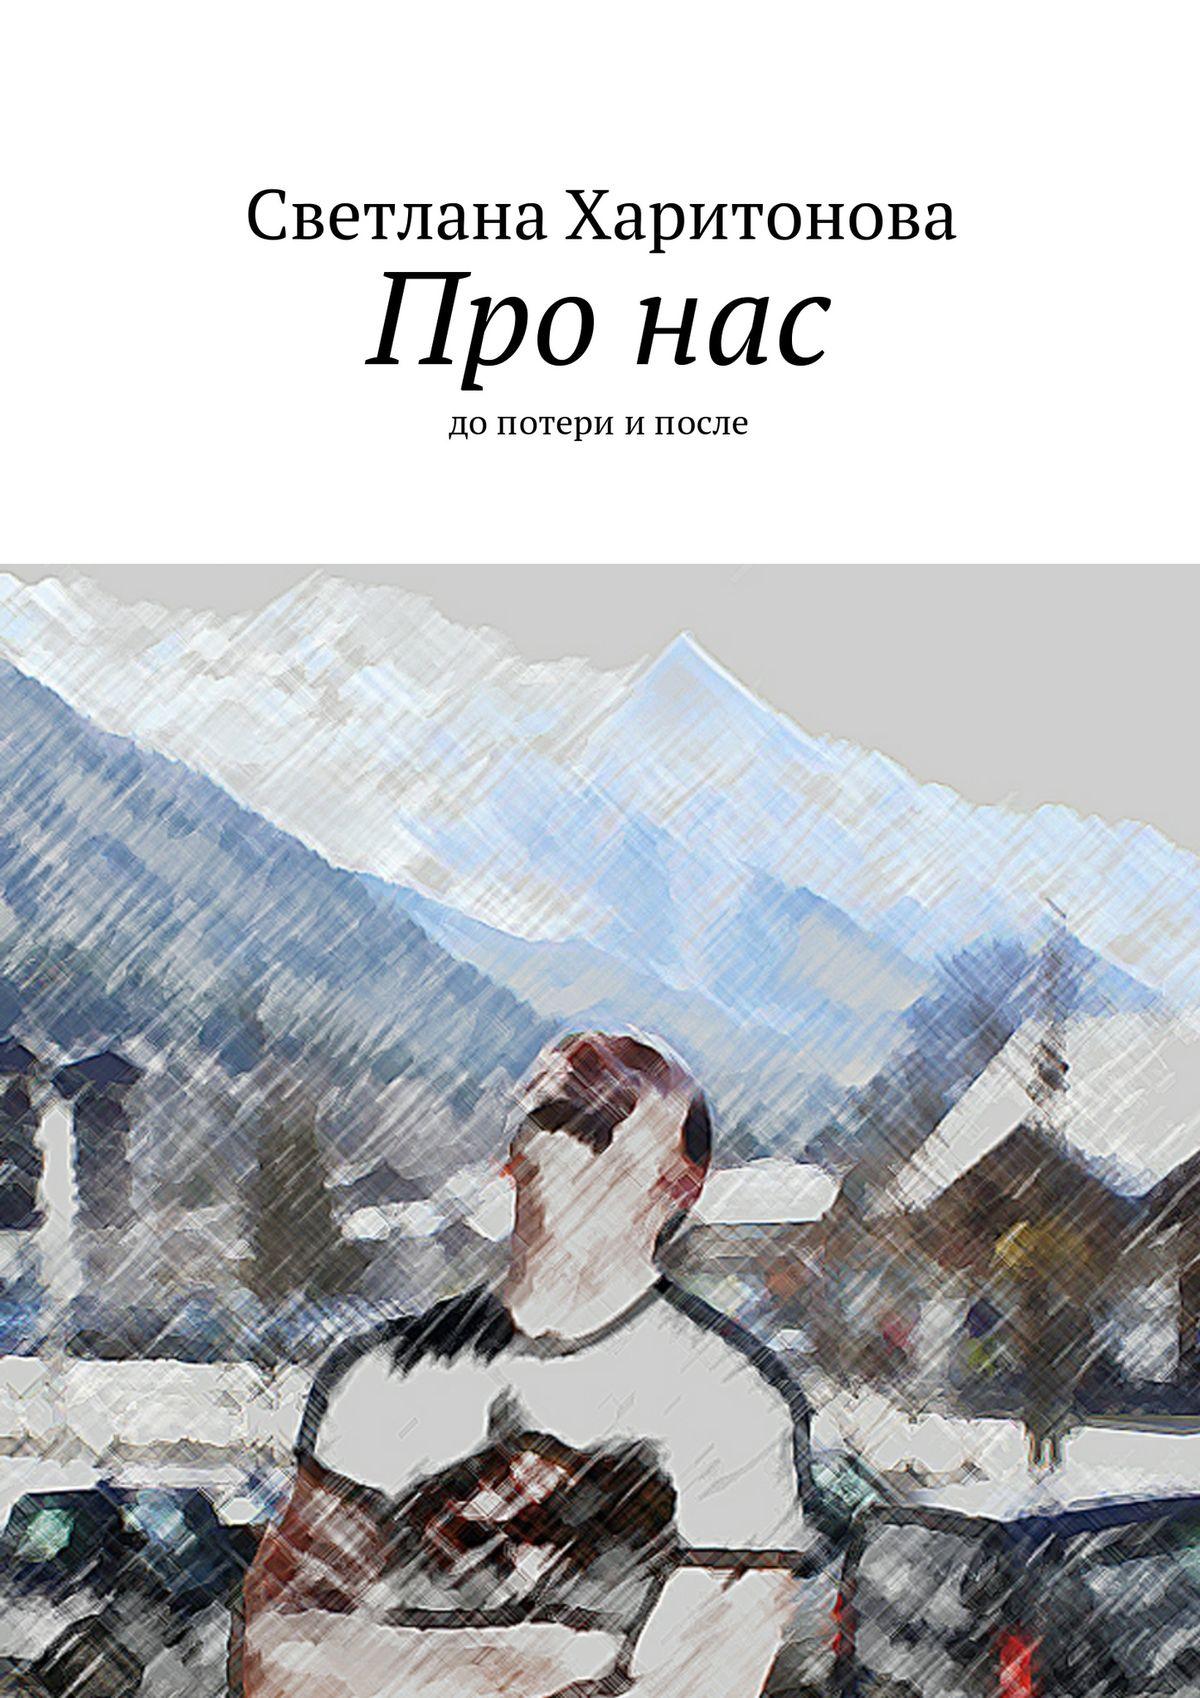 Светлана Харитонова Про нас. допотери ипосле светлана харитонова акушерство